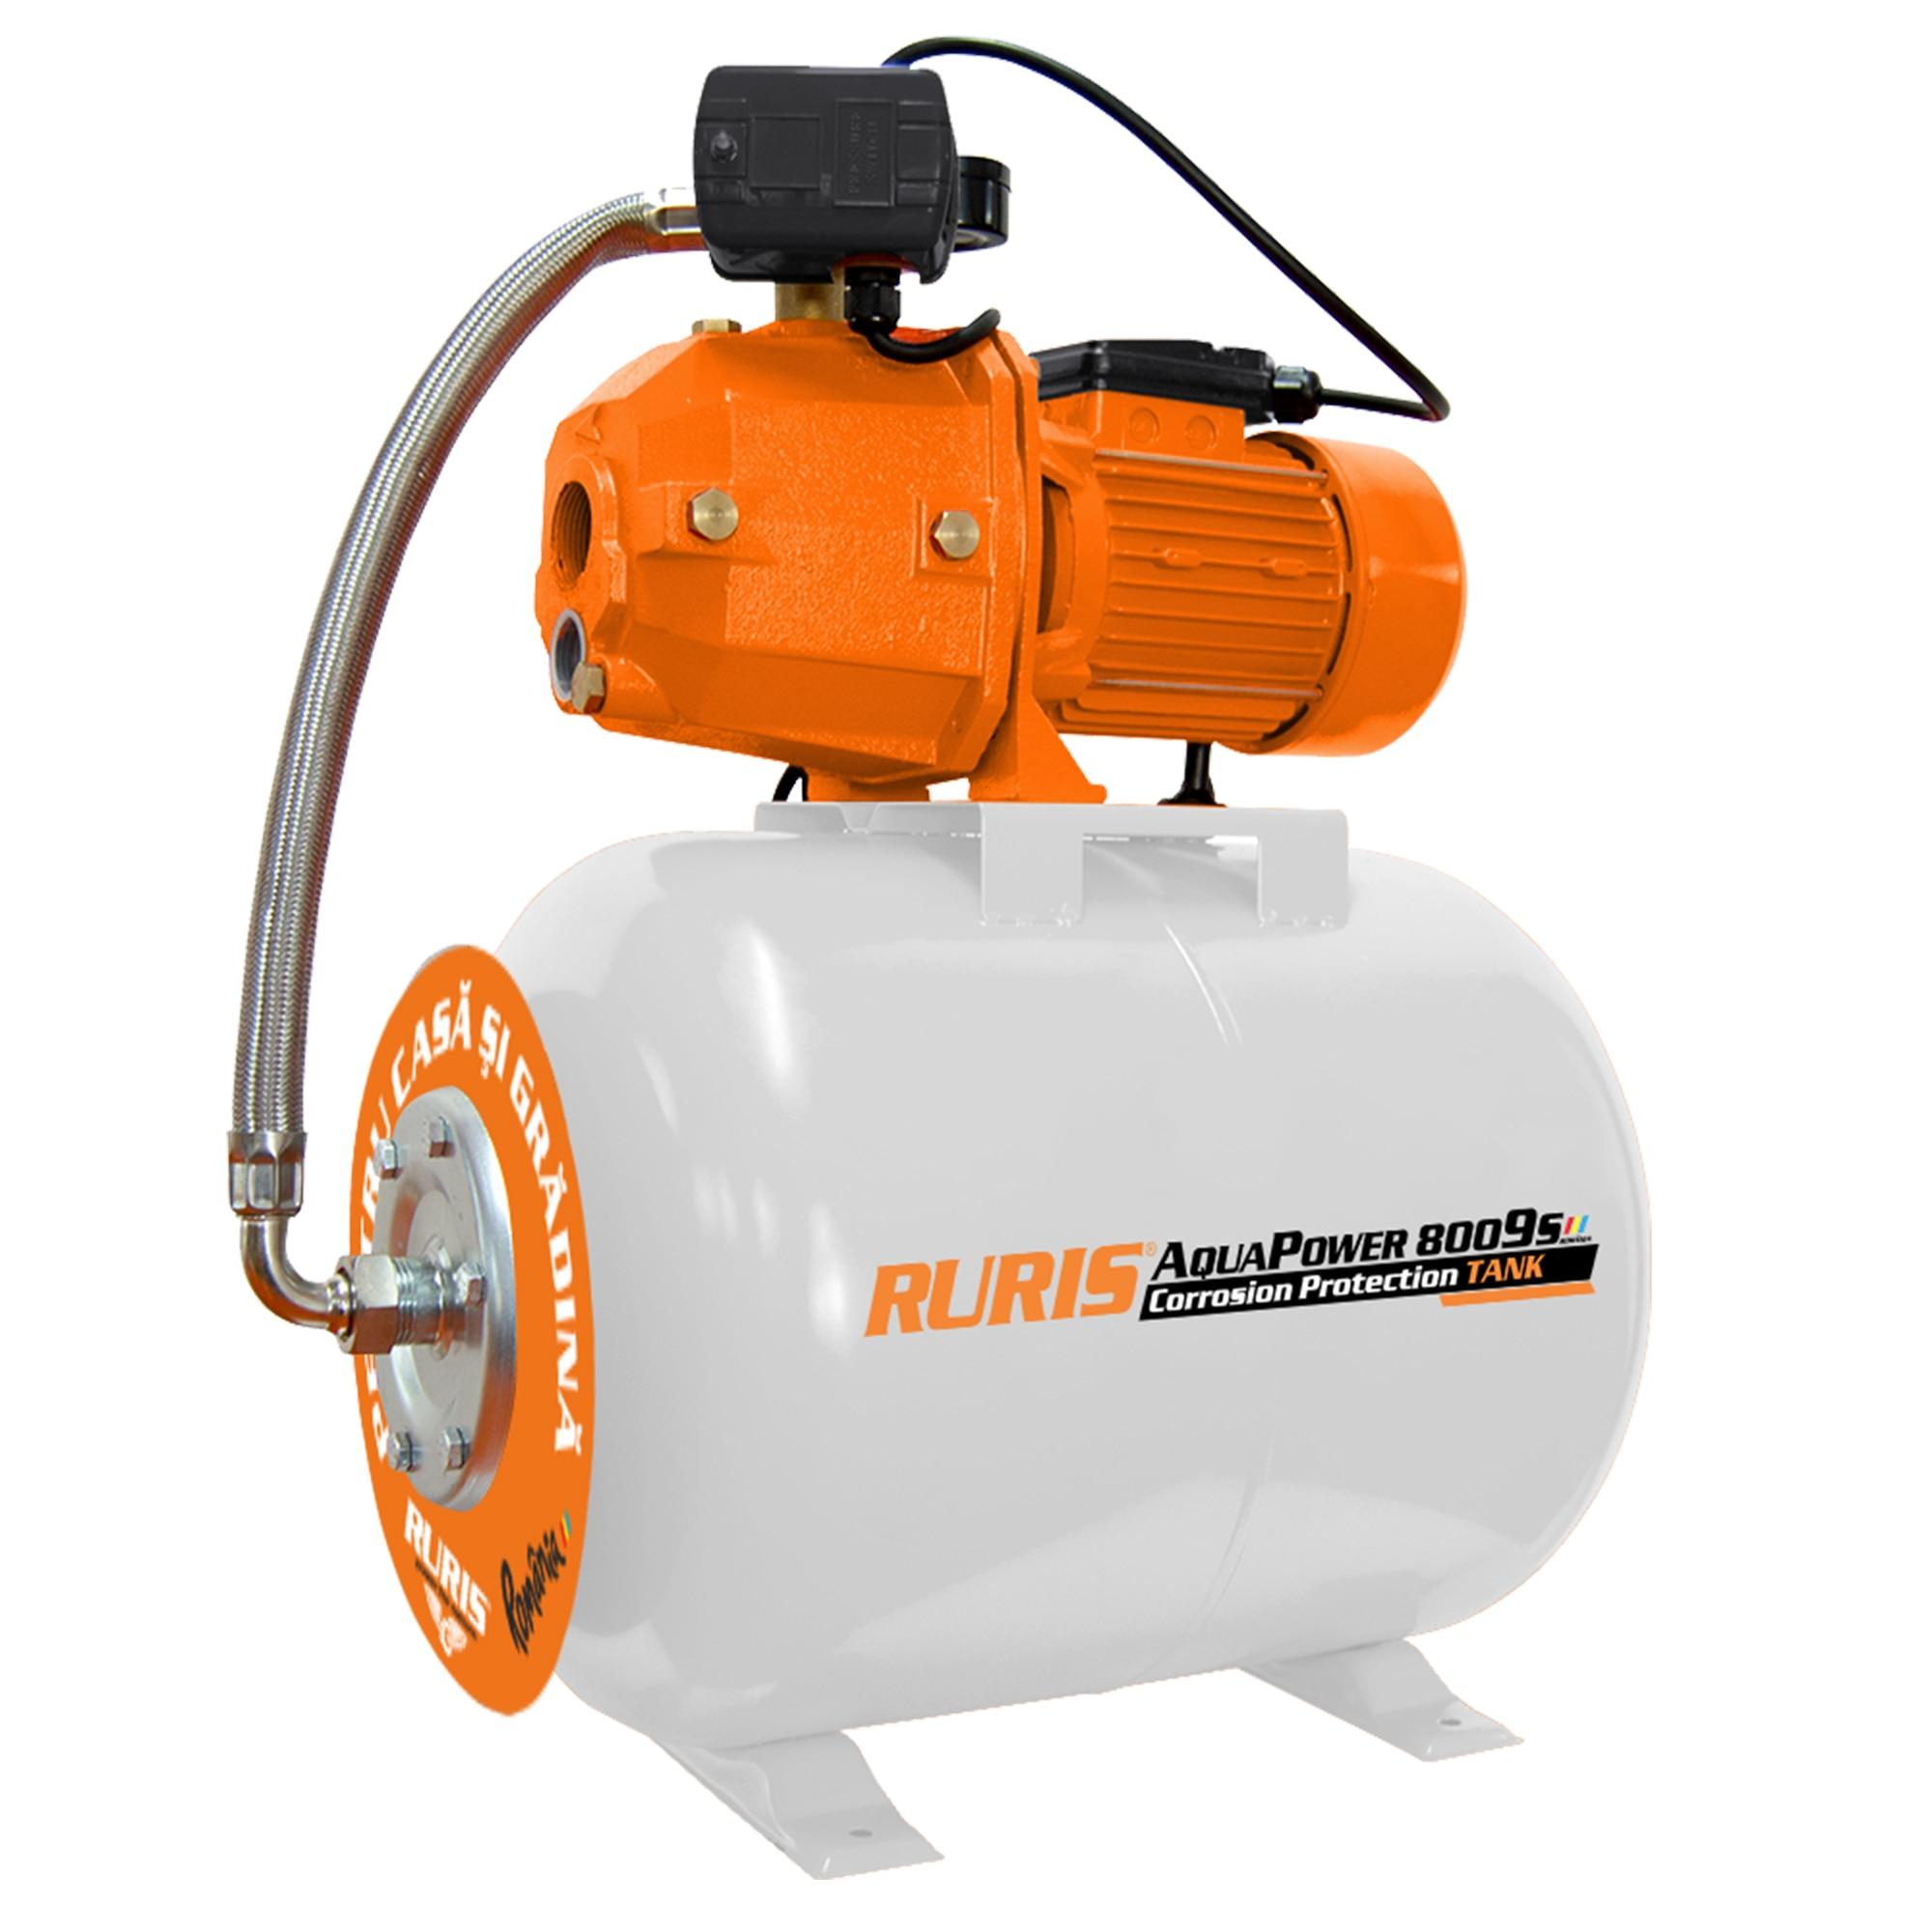 Fotografie Hidrofor RURIS aquapower 8009S, 1.100 W, 50 l , debit 30 l/min, 55 m inaltime refulare, 25 m adancime absorbtie